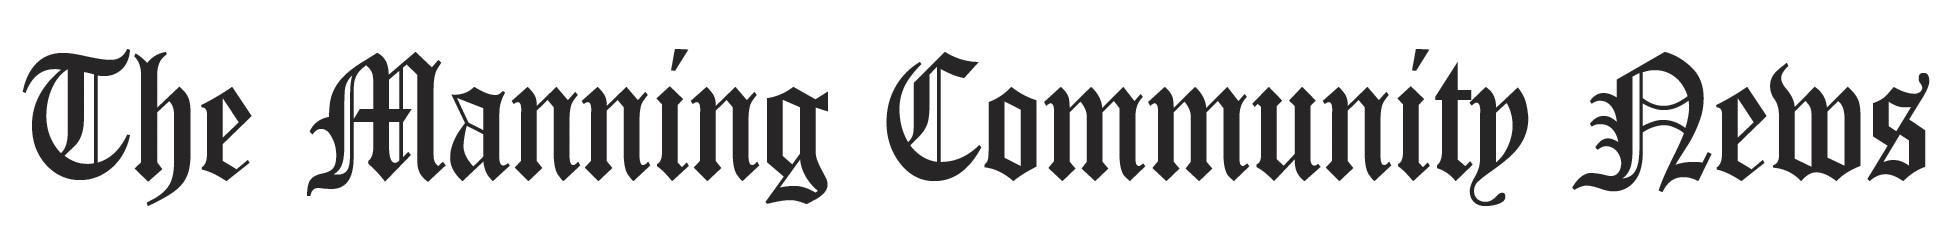 The Manning Community News